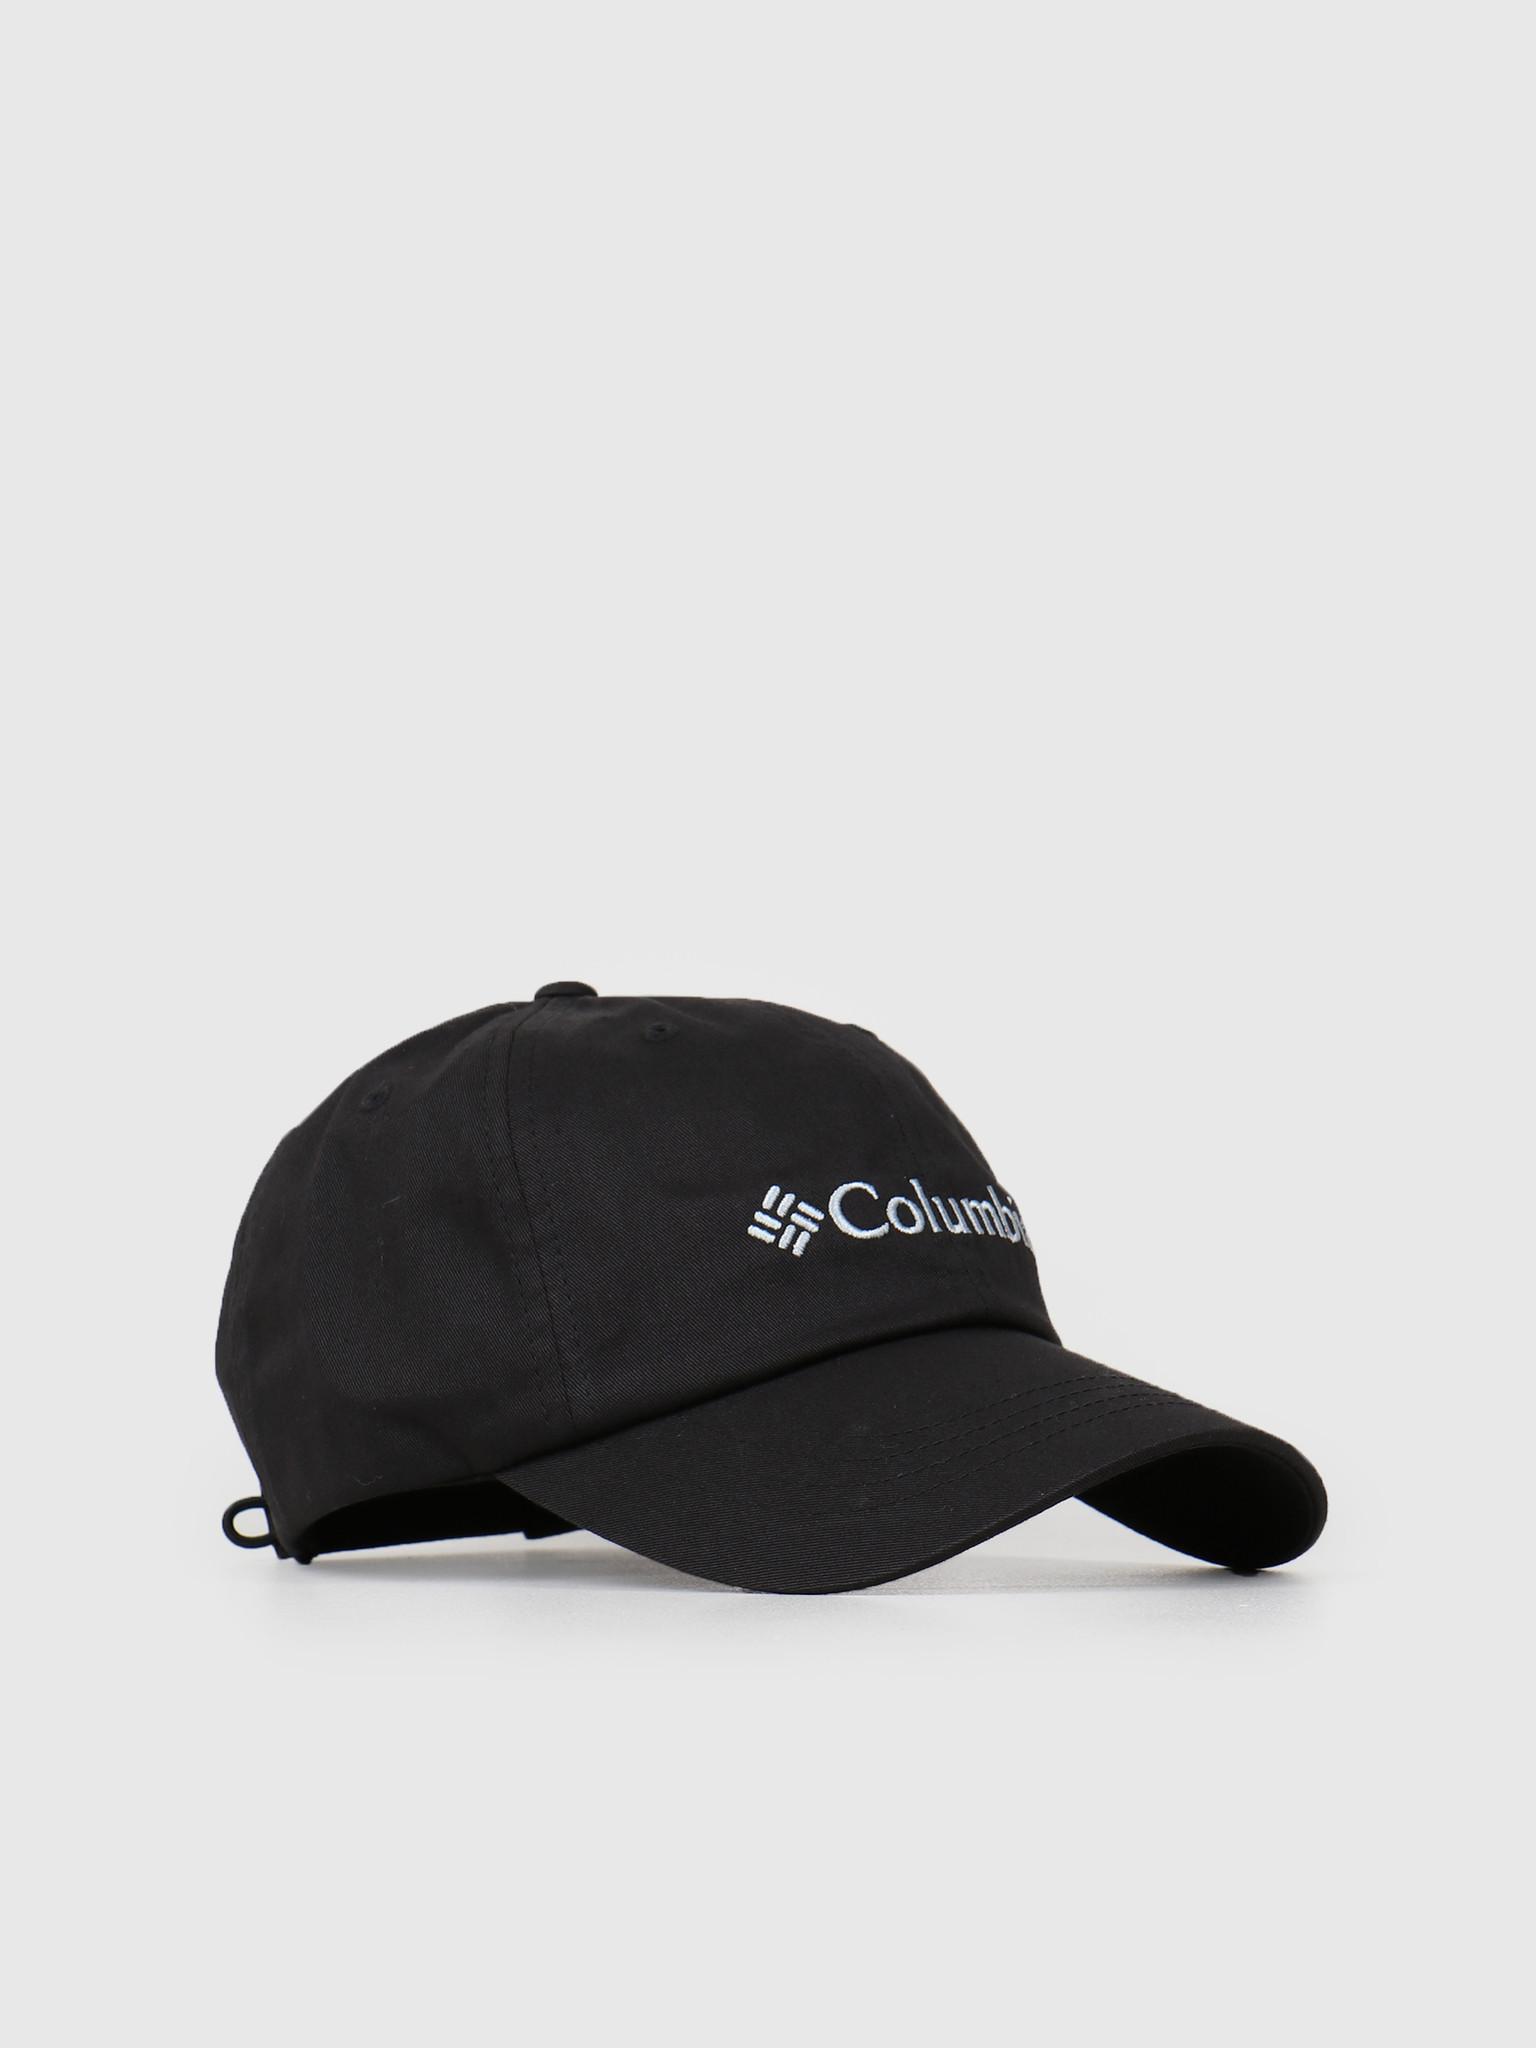 Columbia ROC II Hat Black Columbia 1766611010 - FRESHCOTTON 8c9a43f80cb